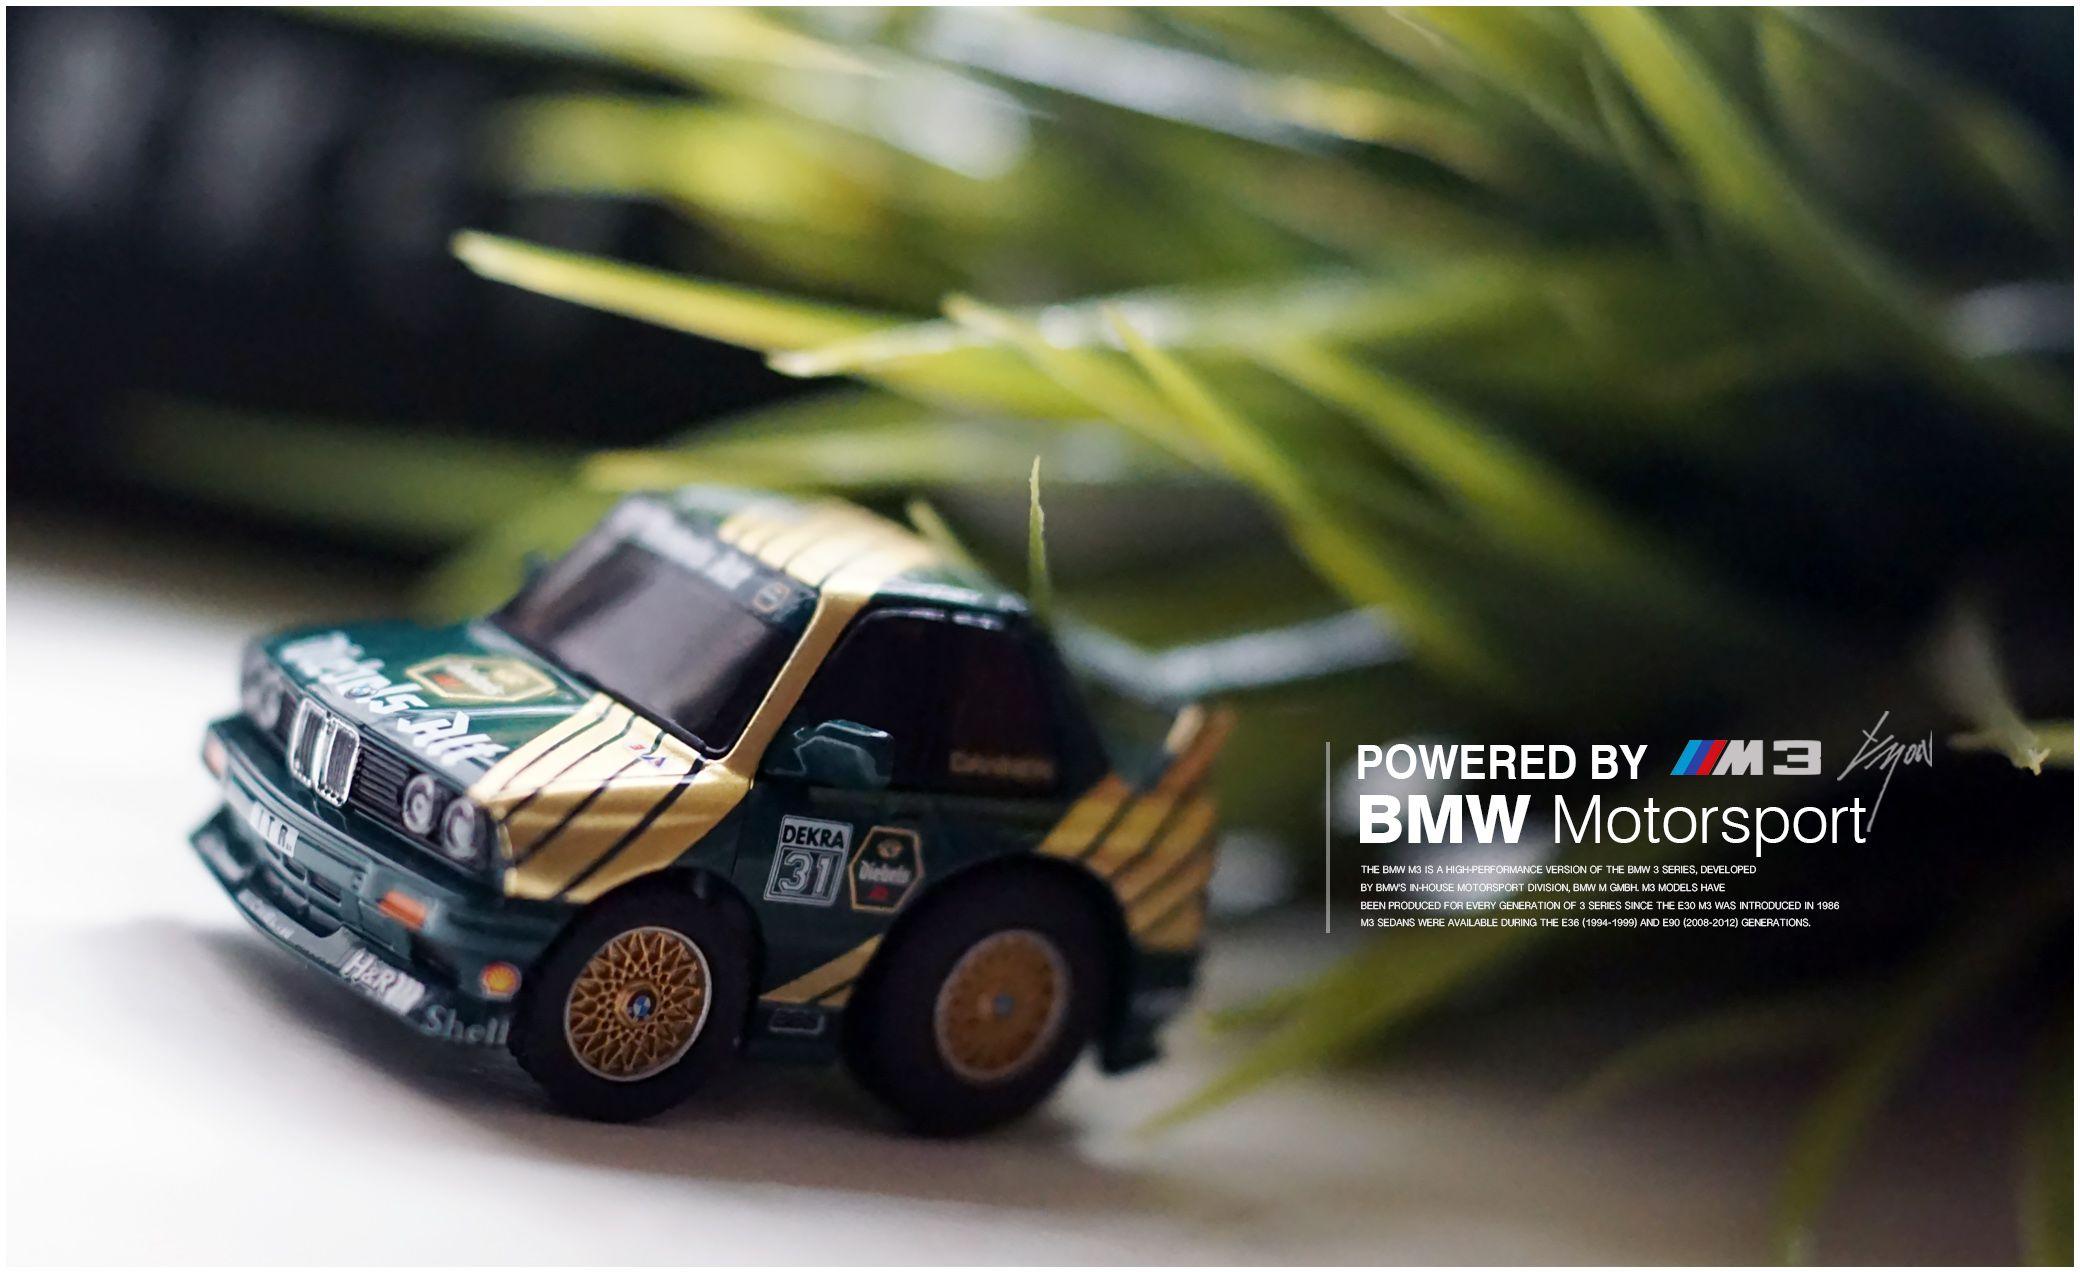 Pin By Amonlin On Choro Q Toy Car Motorsport Bmw